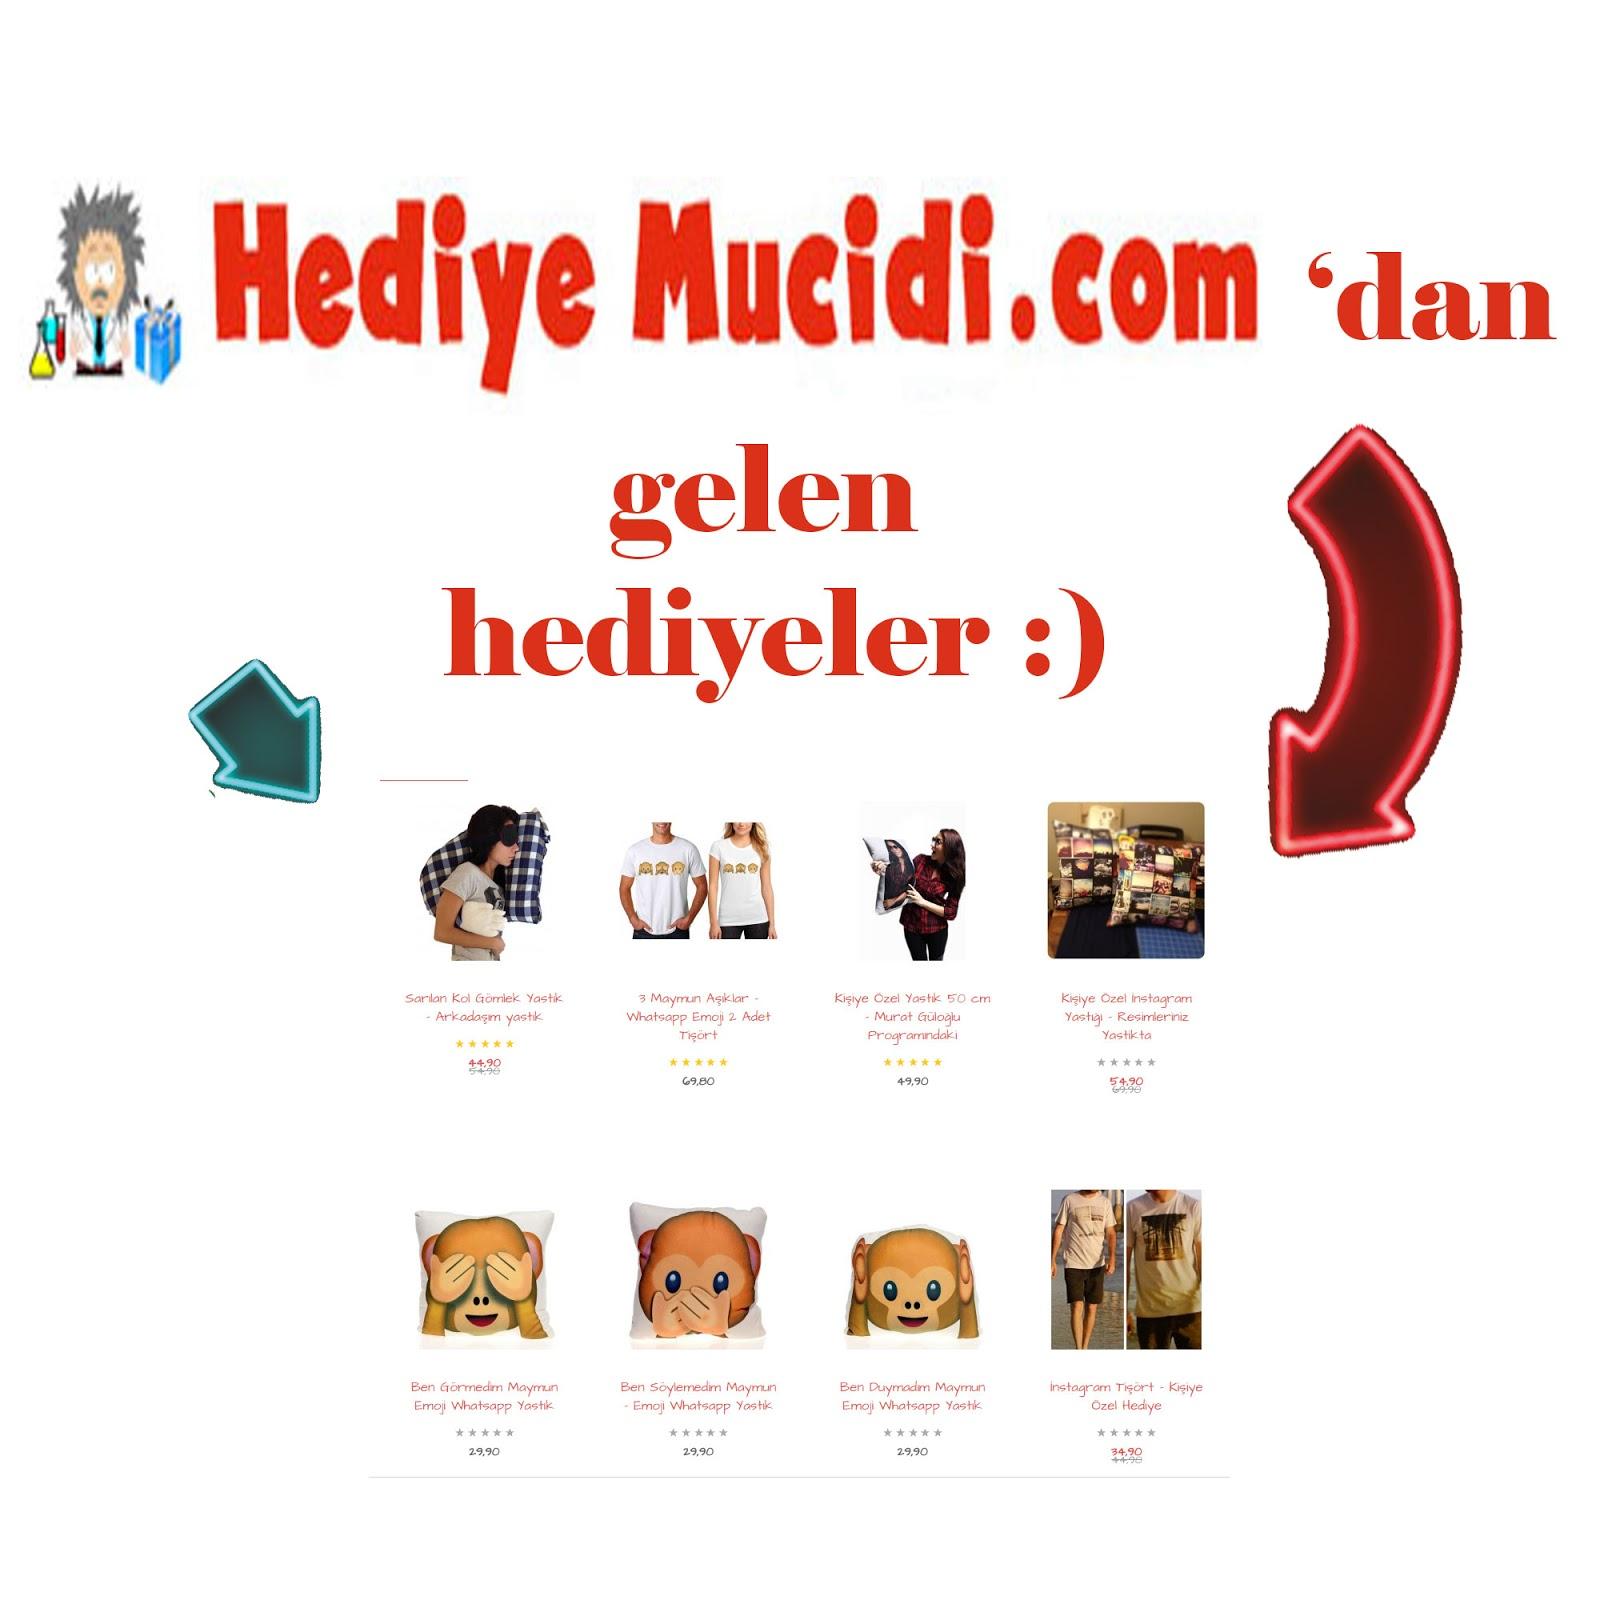 hediyemucidi.com